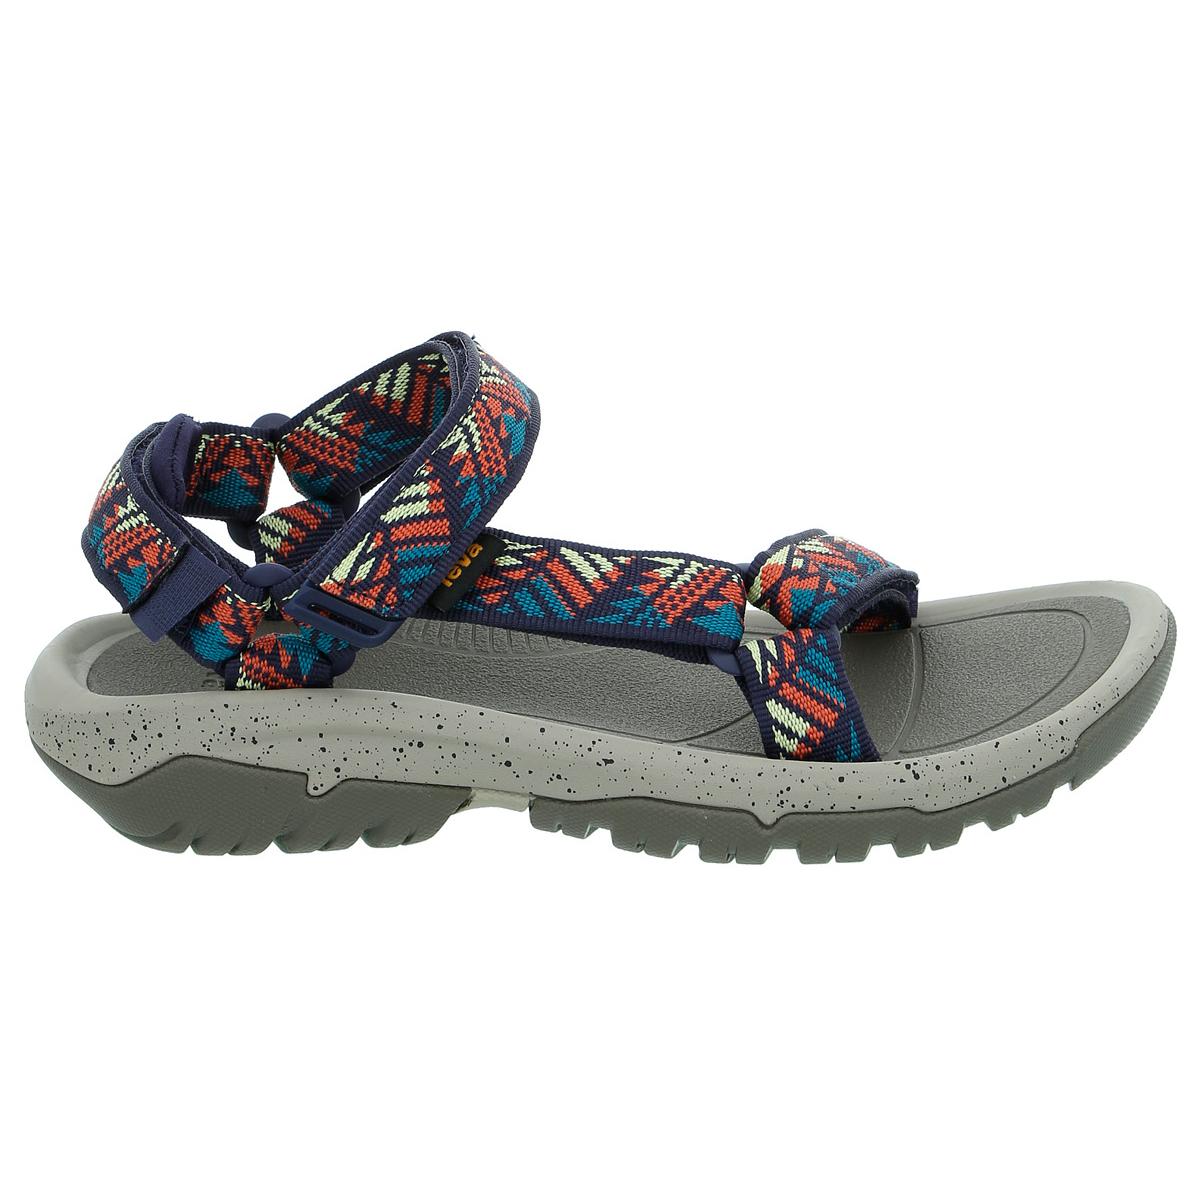 23a78aab2671 Teva - Women s Hurricane XLT 2 - Sandals